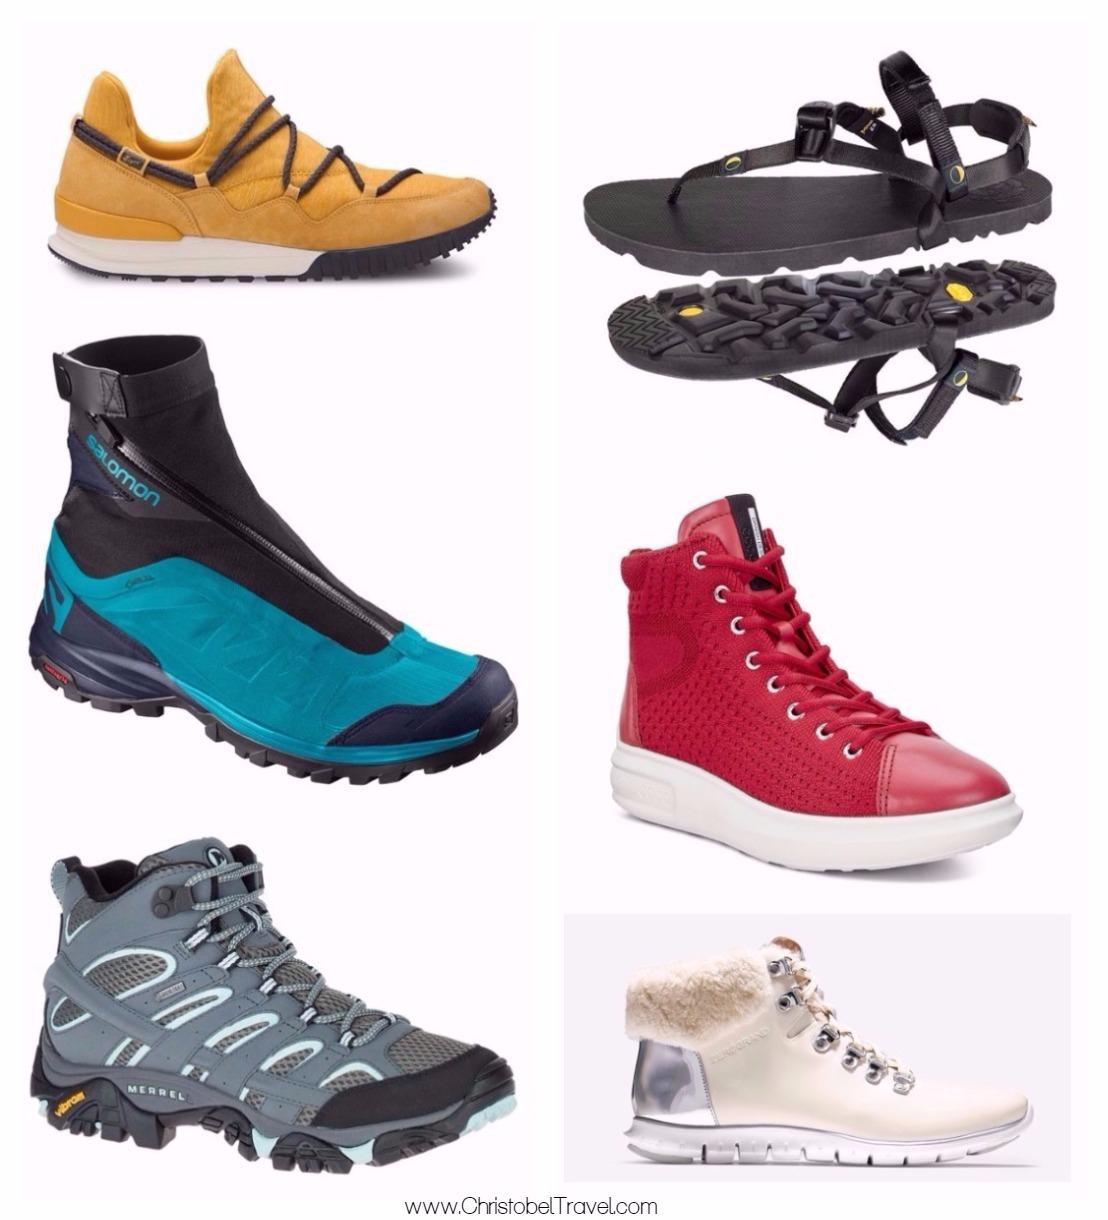 Womens Tarantulace Shoe